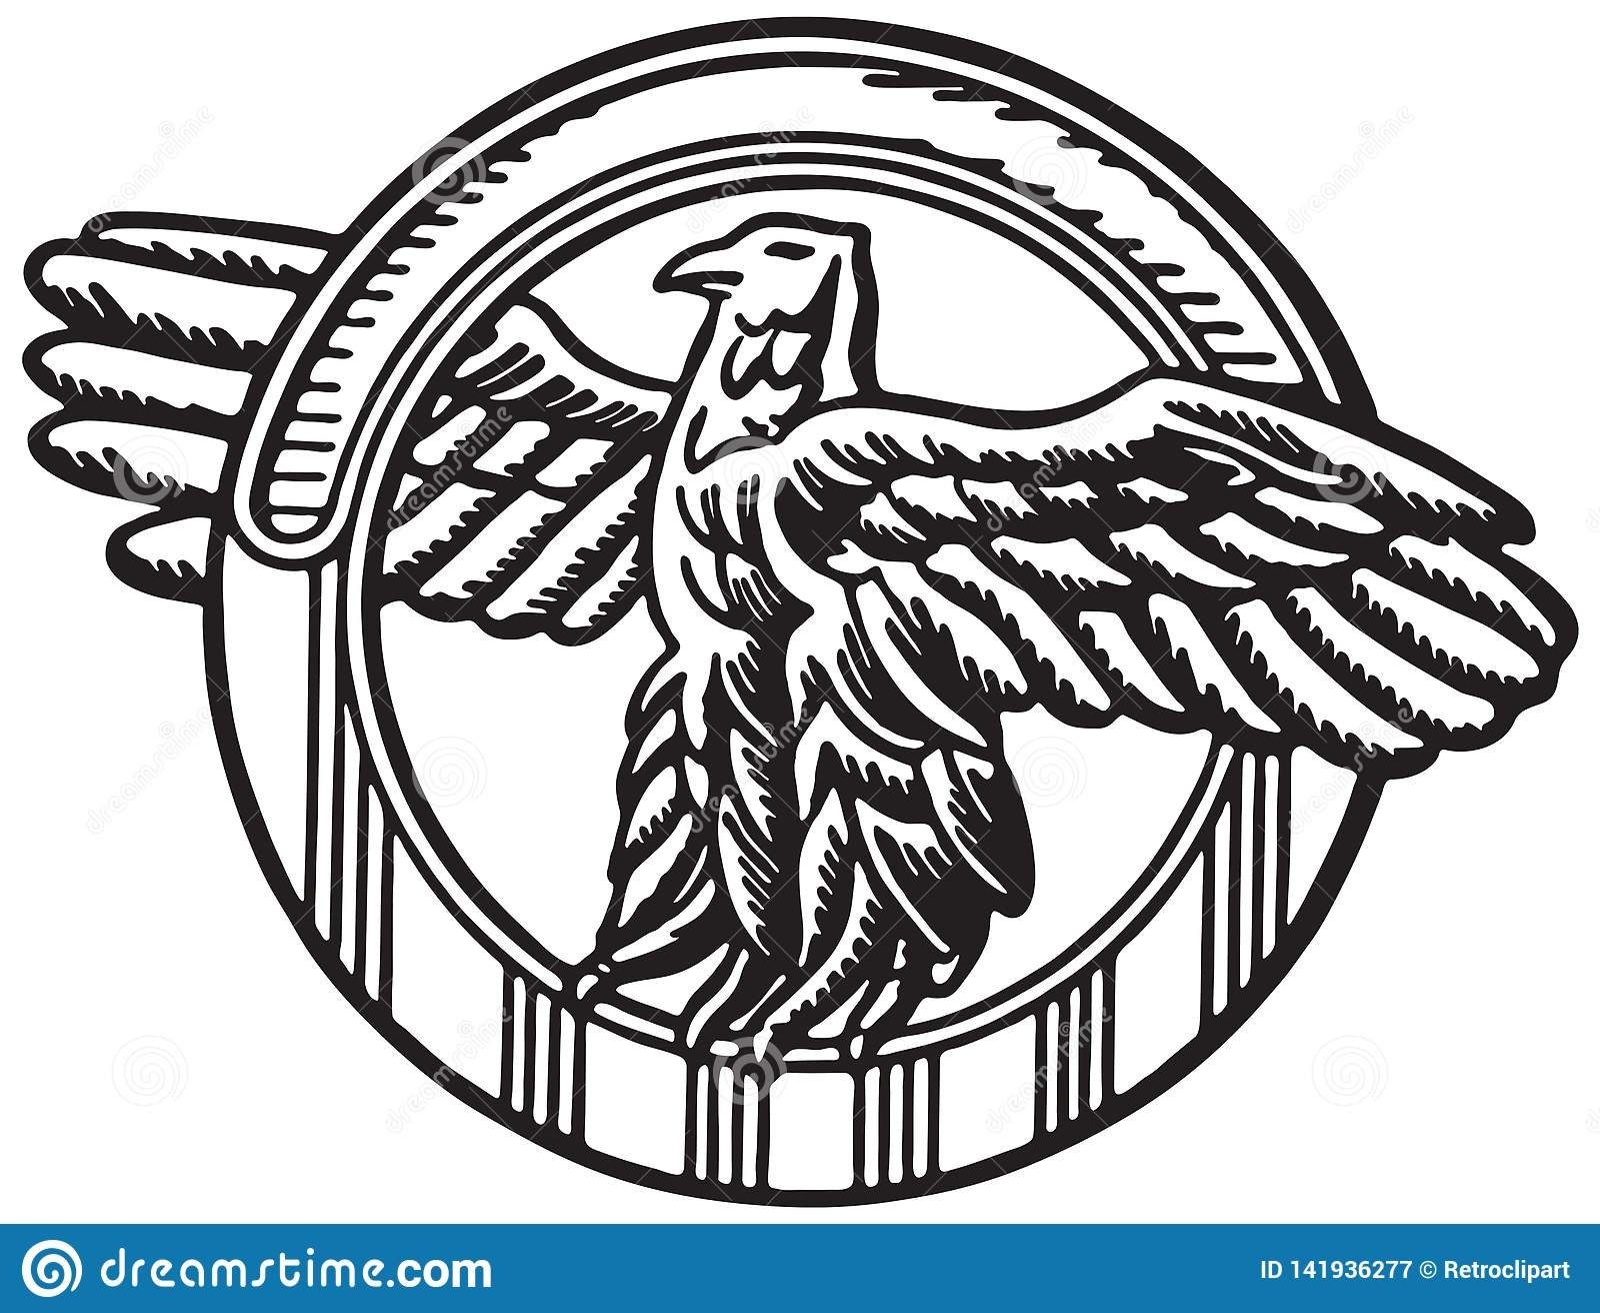 Символ орла